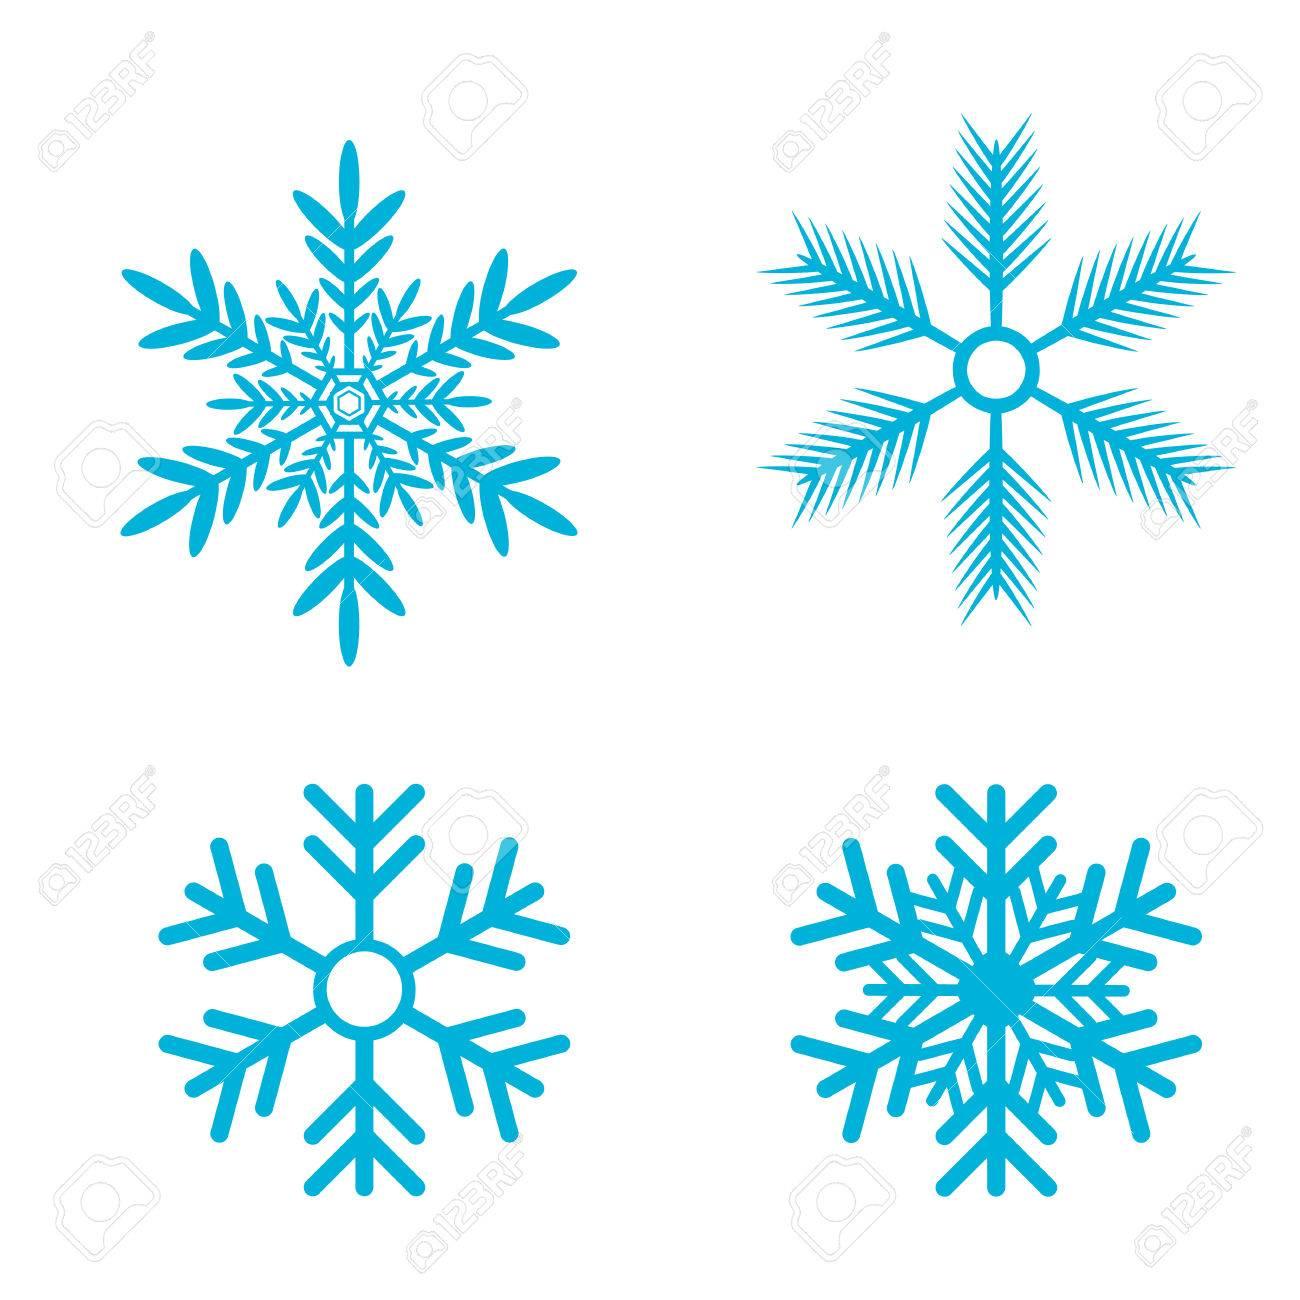 snowflakes vector set snow flake icon set royalty free cliparts rh 123rf com vector snowflakes free download vector snowflakes illustrator